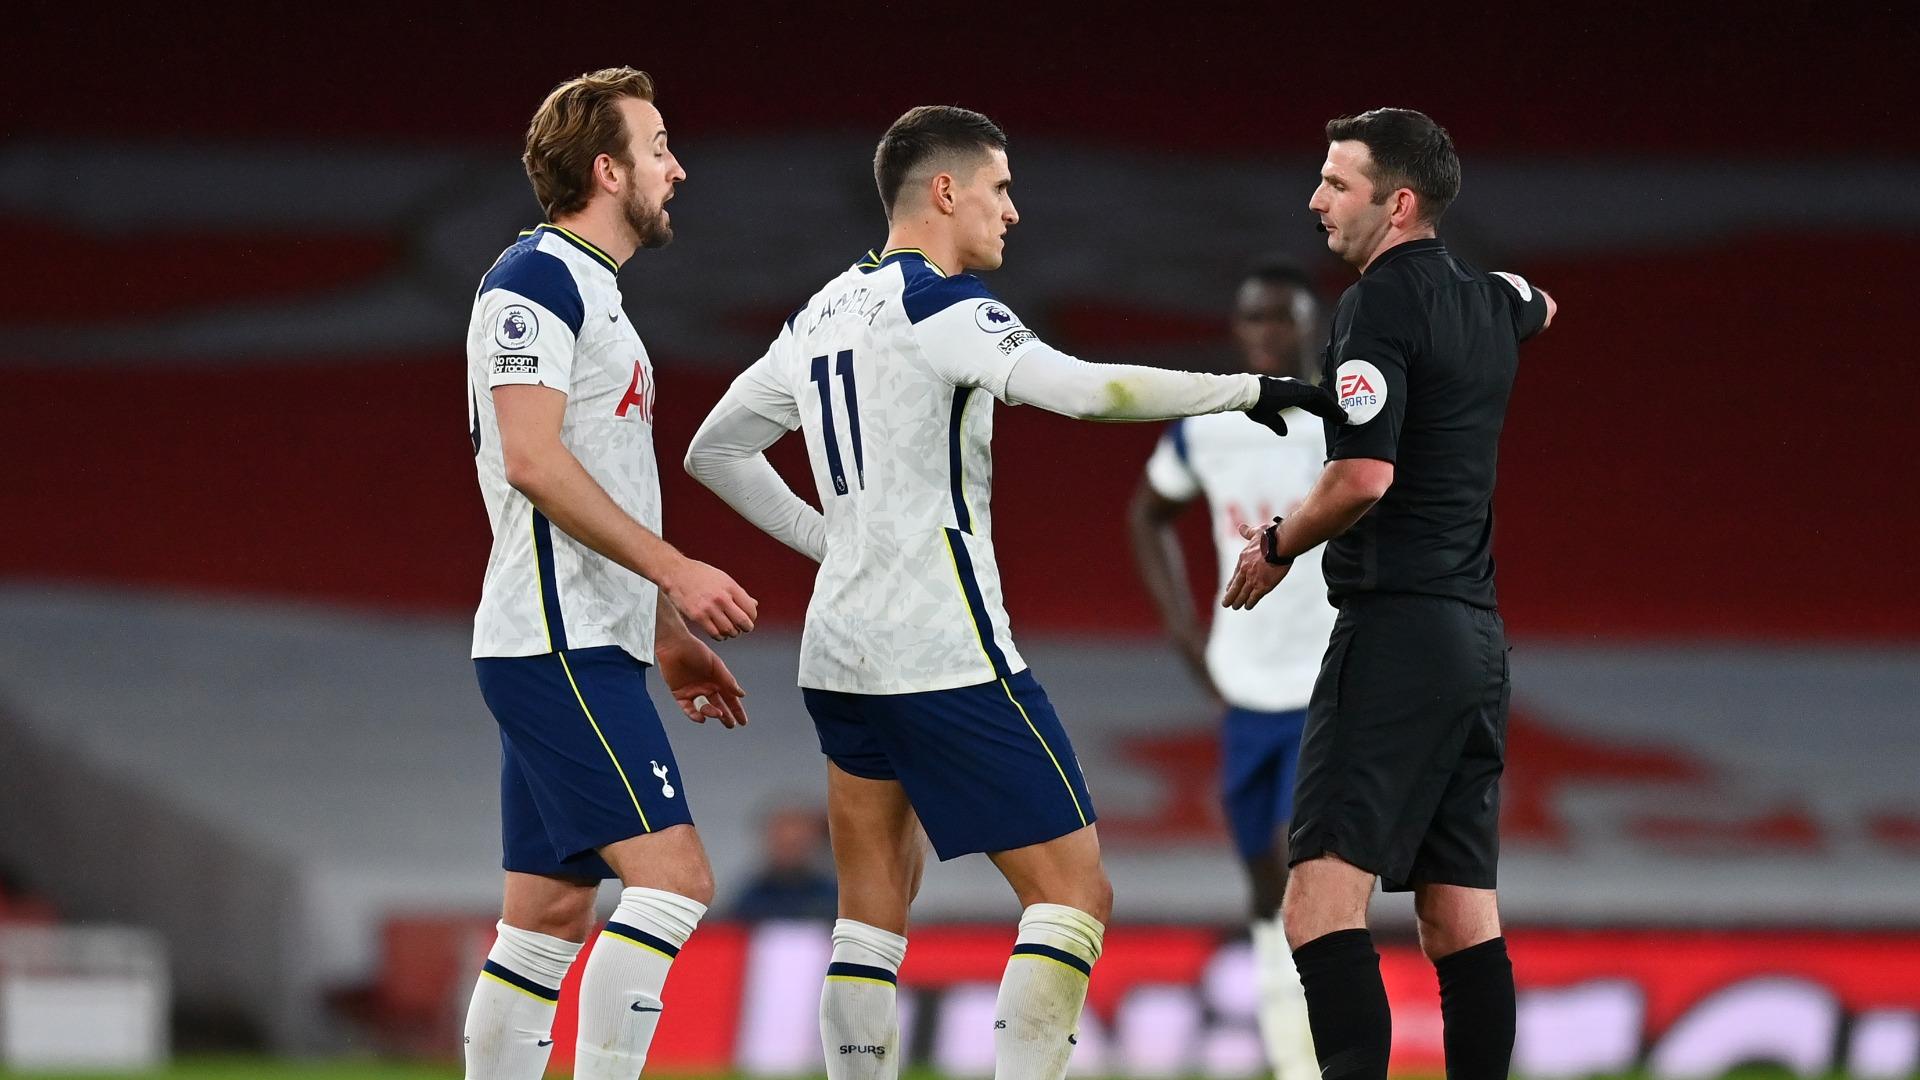 Arsenal 2-1 Tottenham: Lamela goes from hero to villain as Lacazette settles the derby